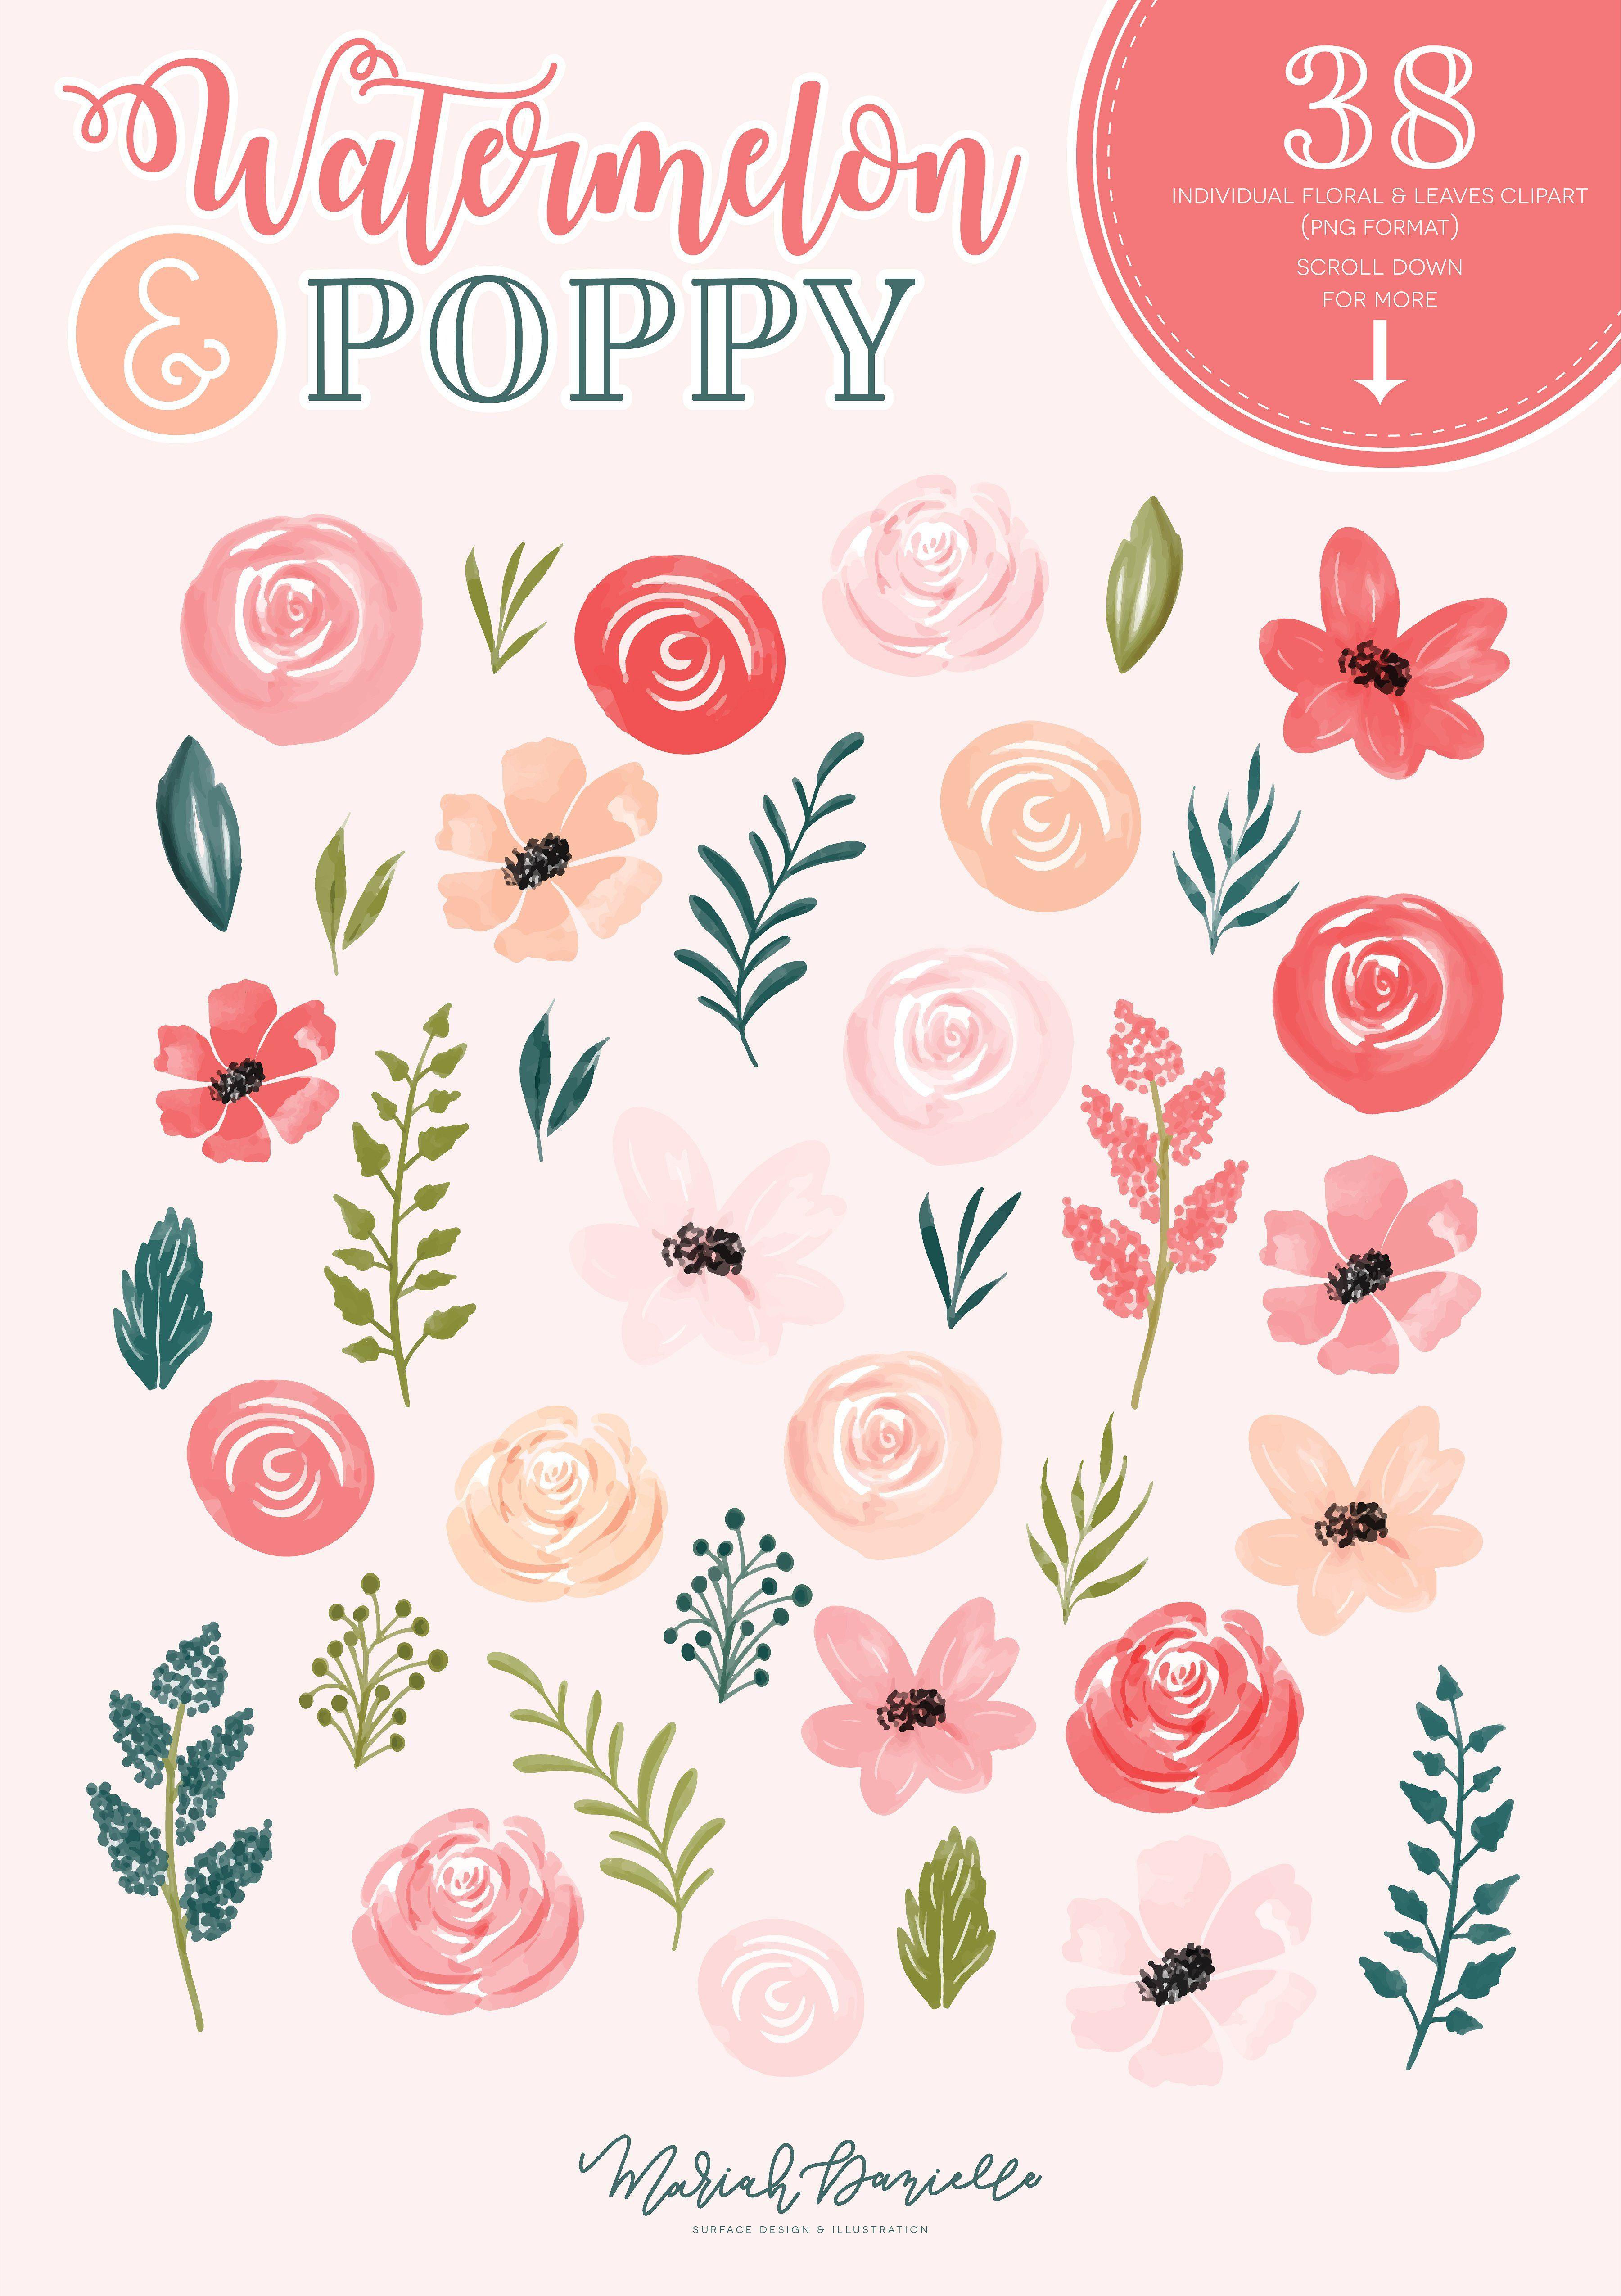 Watermelon Poppy Floral Clipart Set Art Prints Prints And Logos